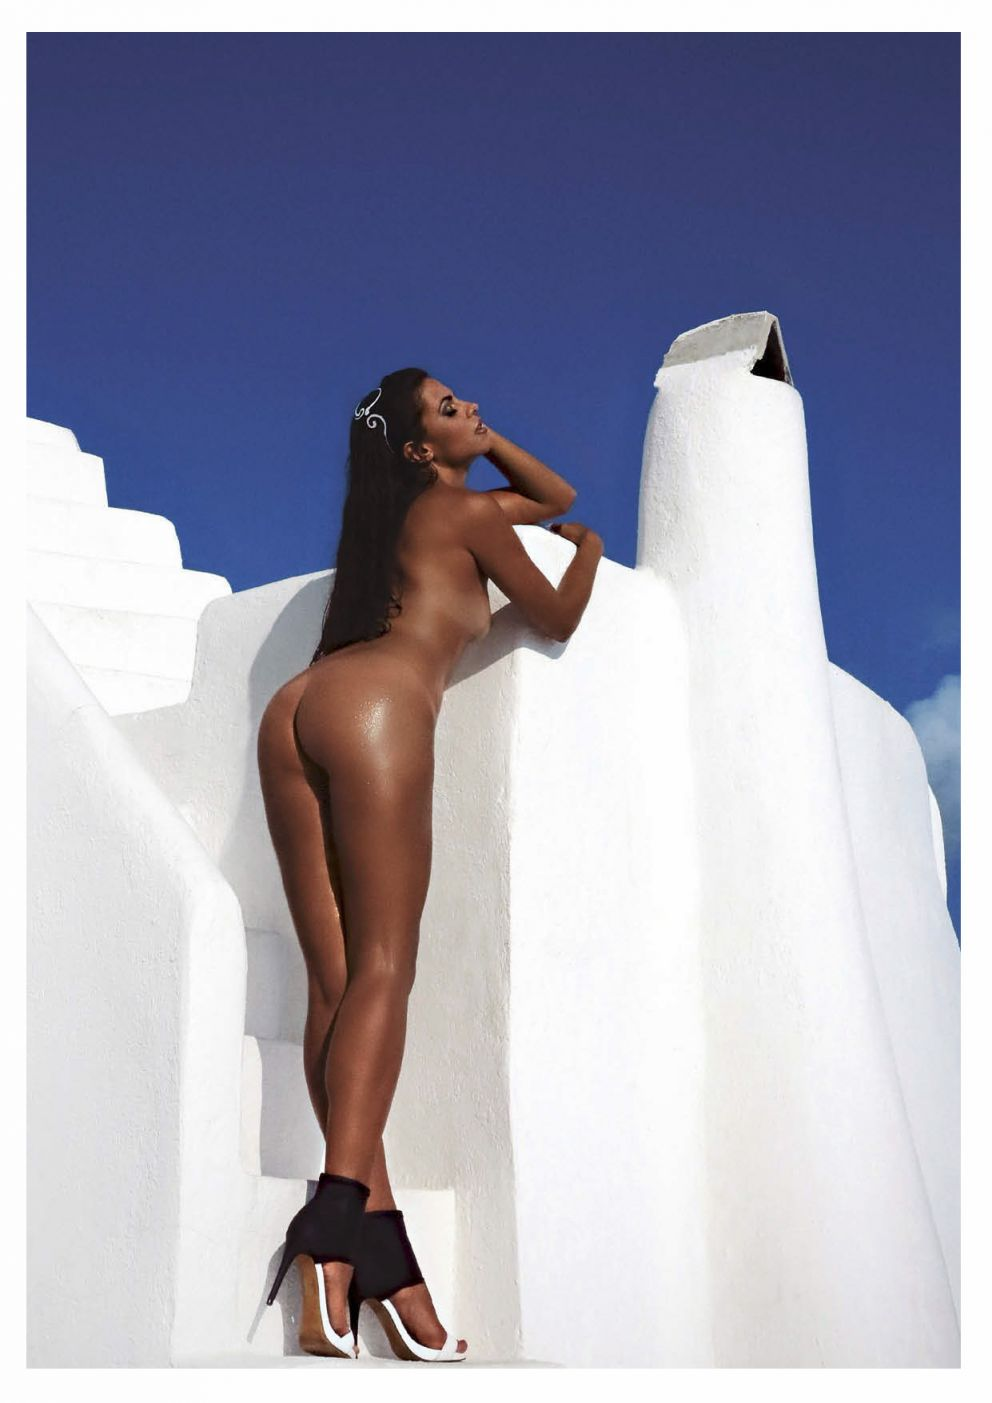 Natasa Naneva nude photoset